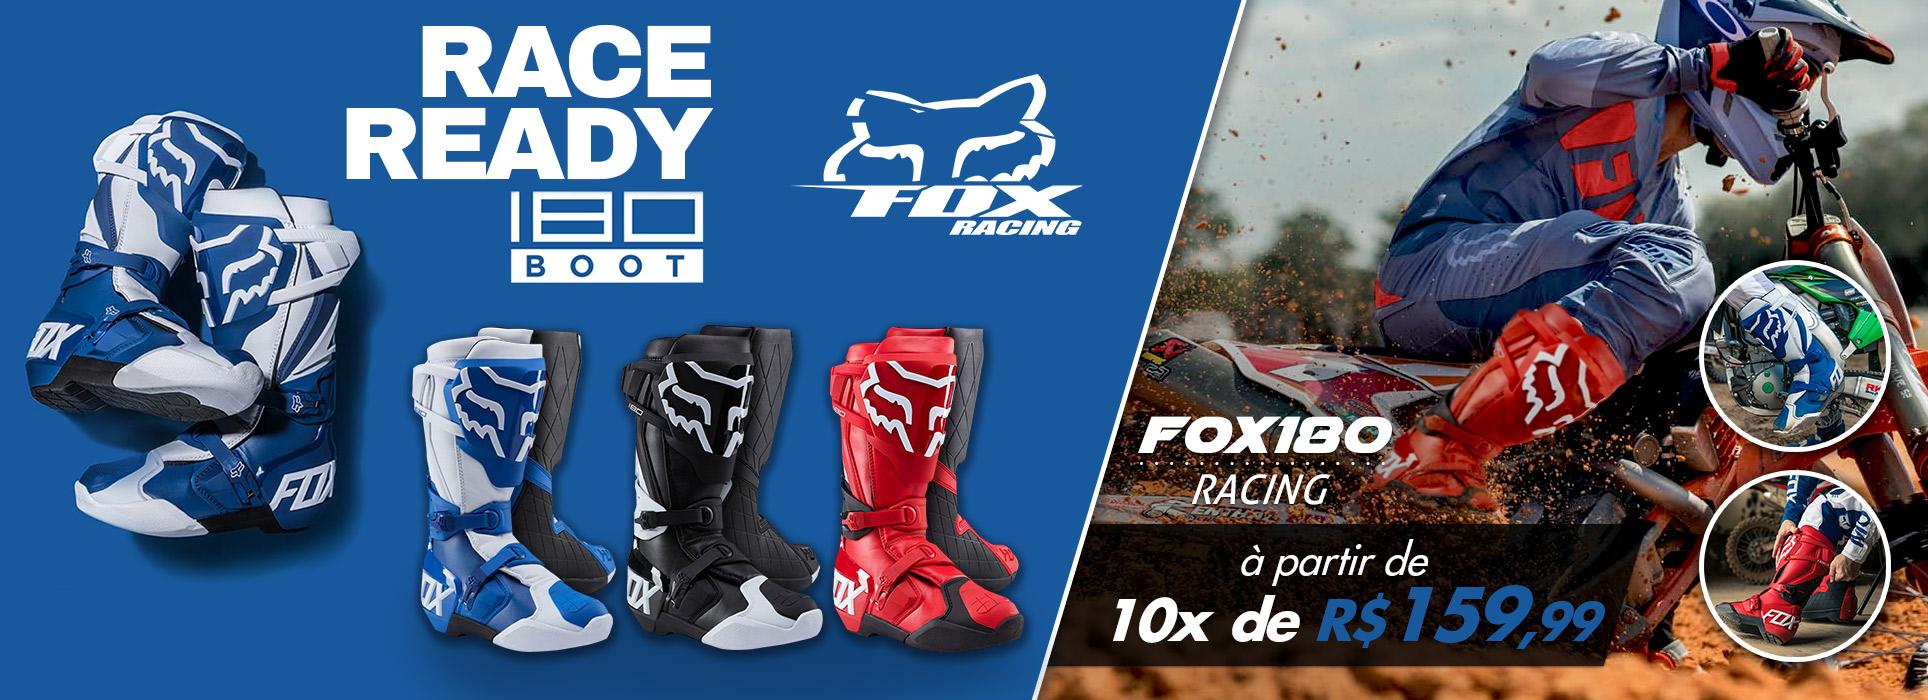 bota-fox-180